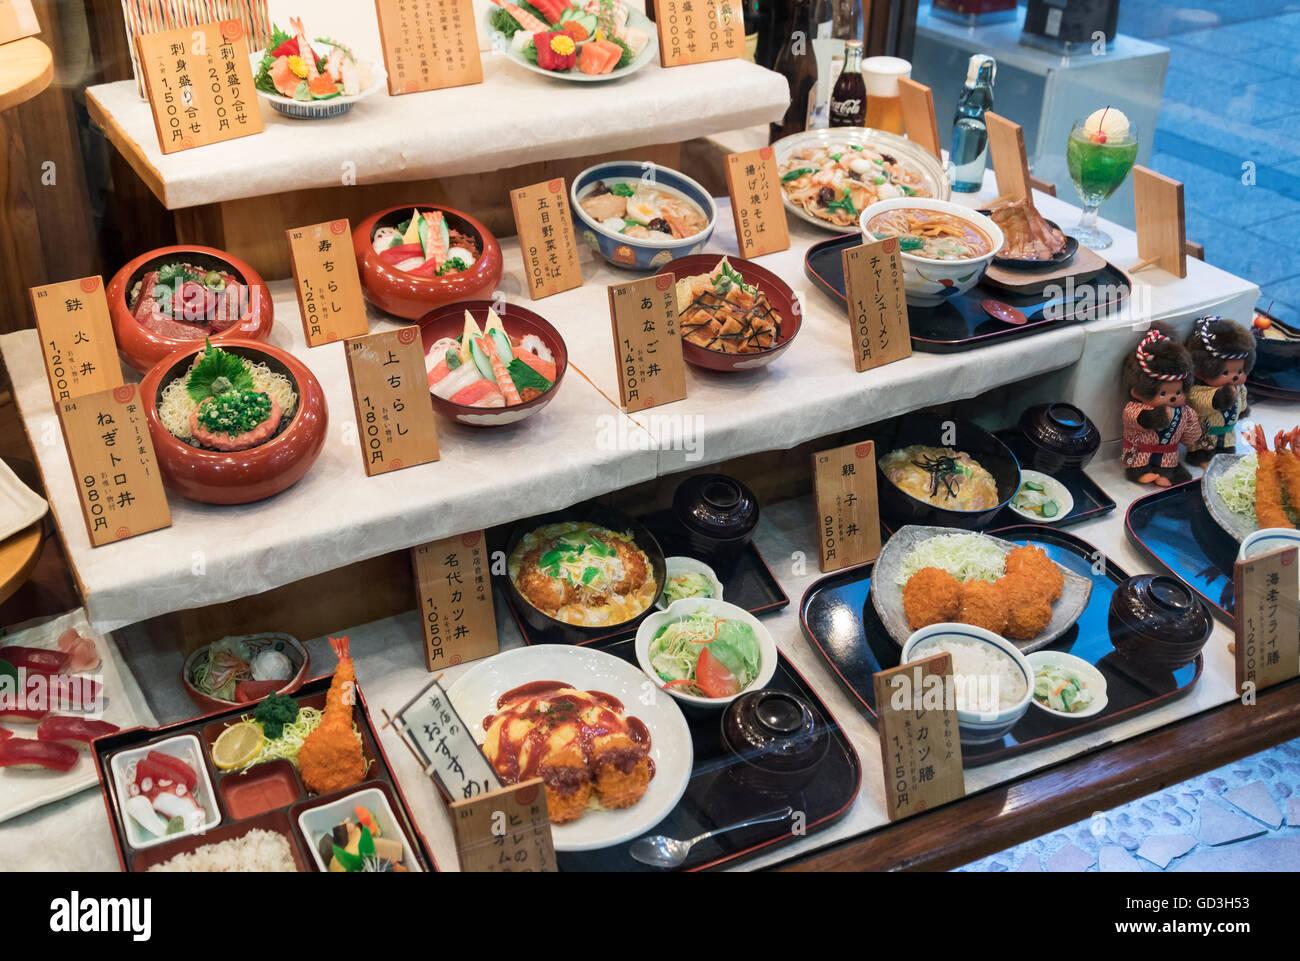 Sampuru, plastic replicas of meals served in Japanese restaurants, Tokyo, Japan - Stock Image